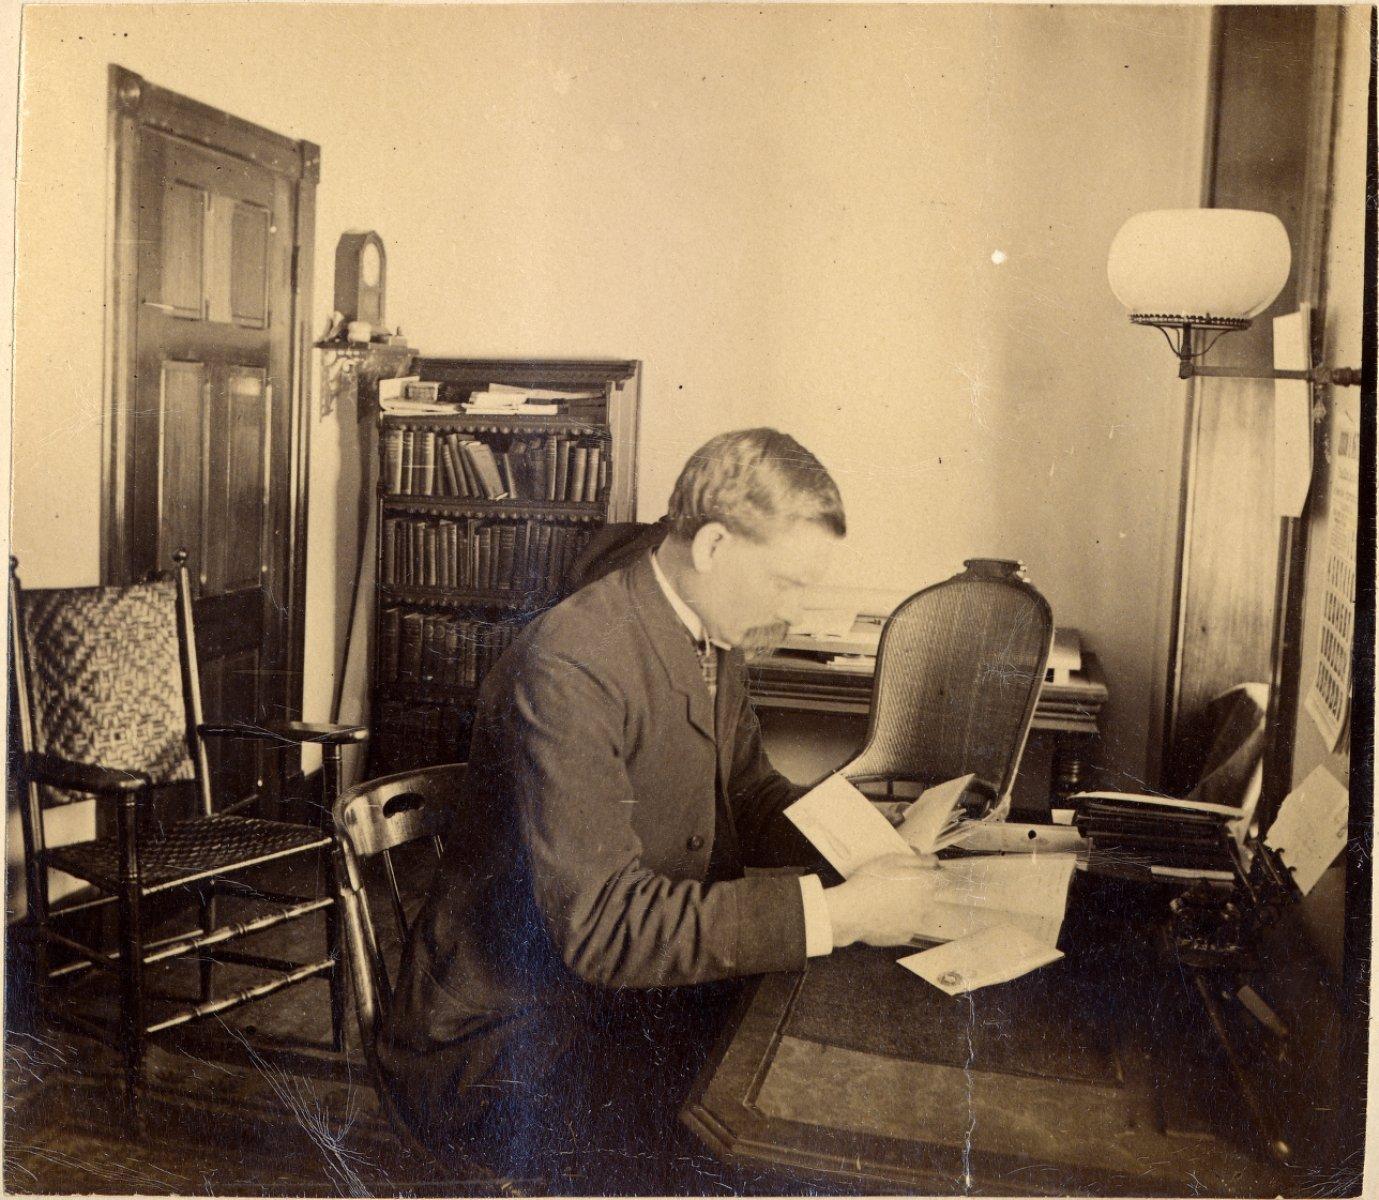 Archibald G. Delaney, 1884